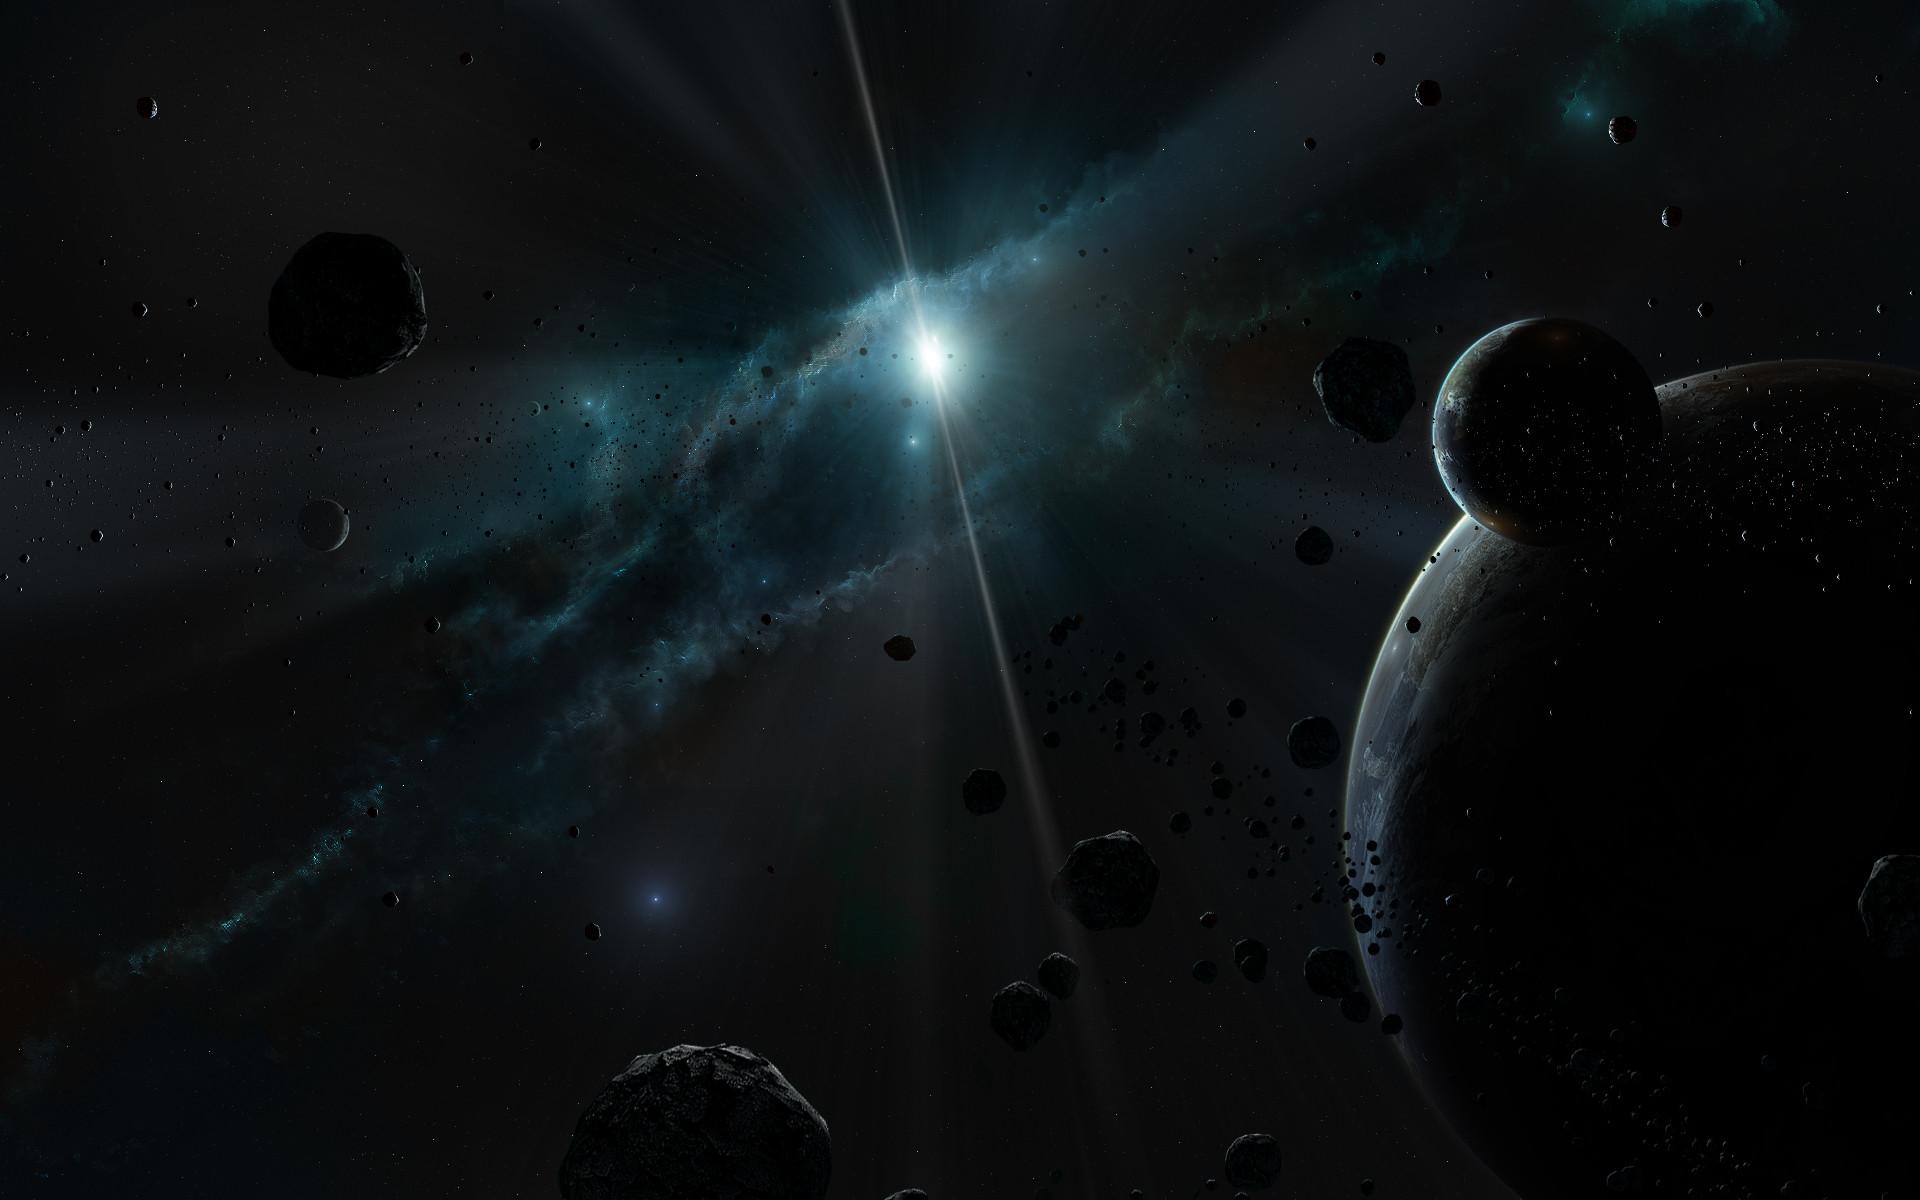 Dark Space Wallpaper